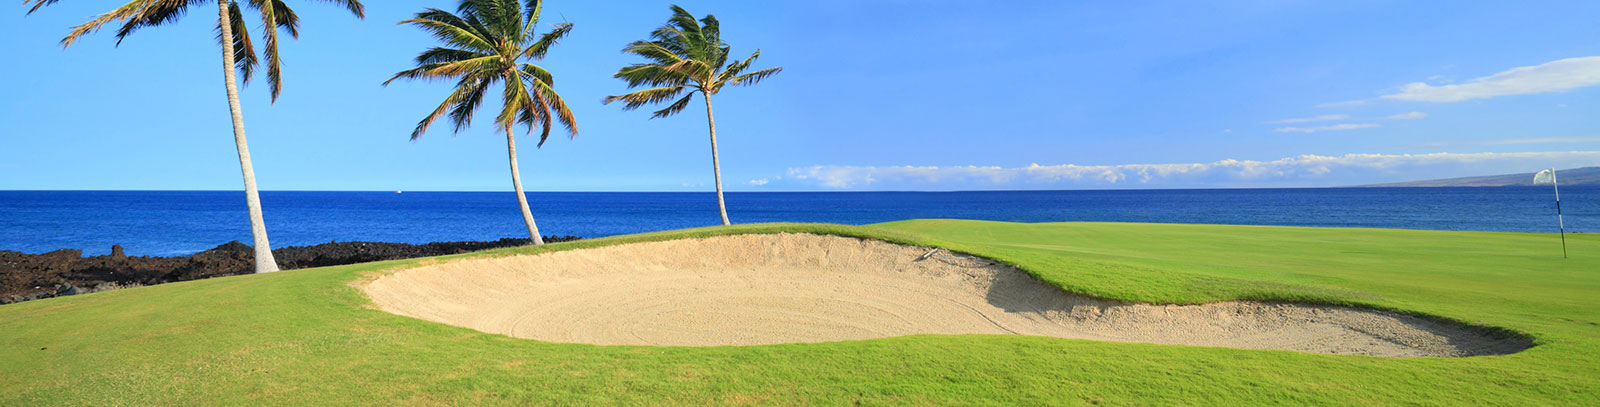 World Class Golf in Puerto Vallarta